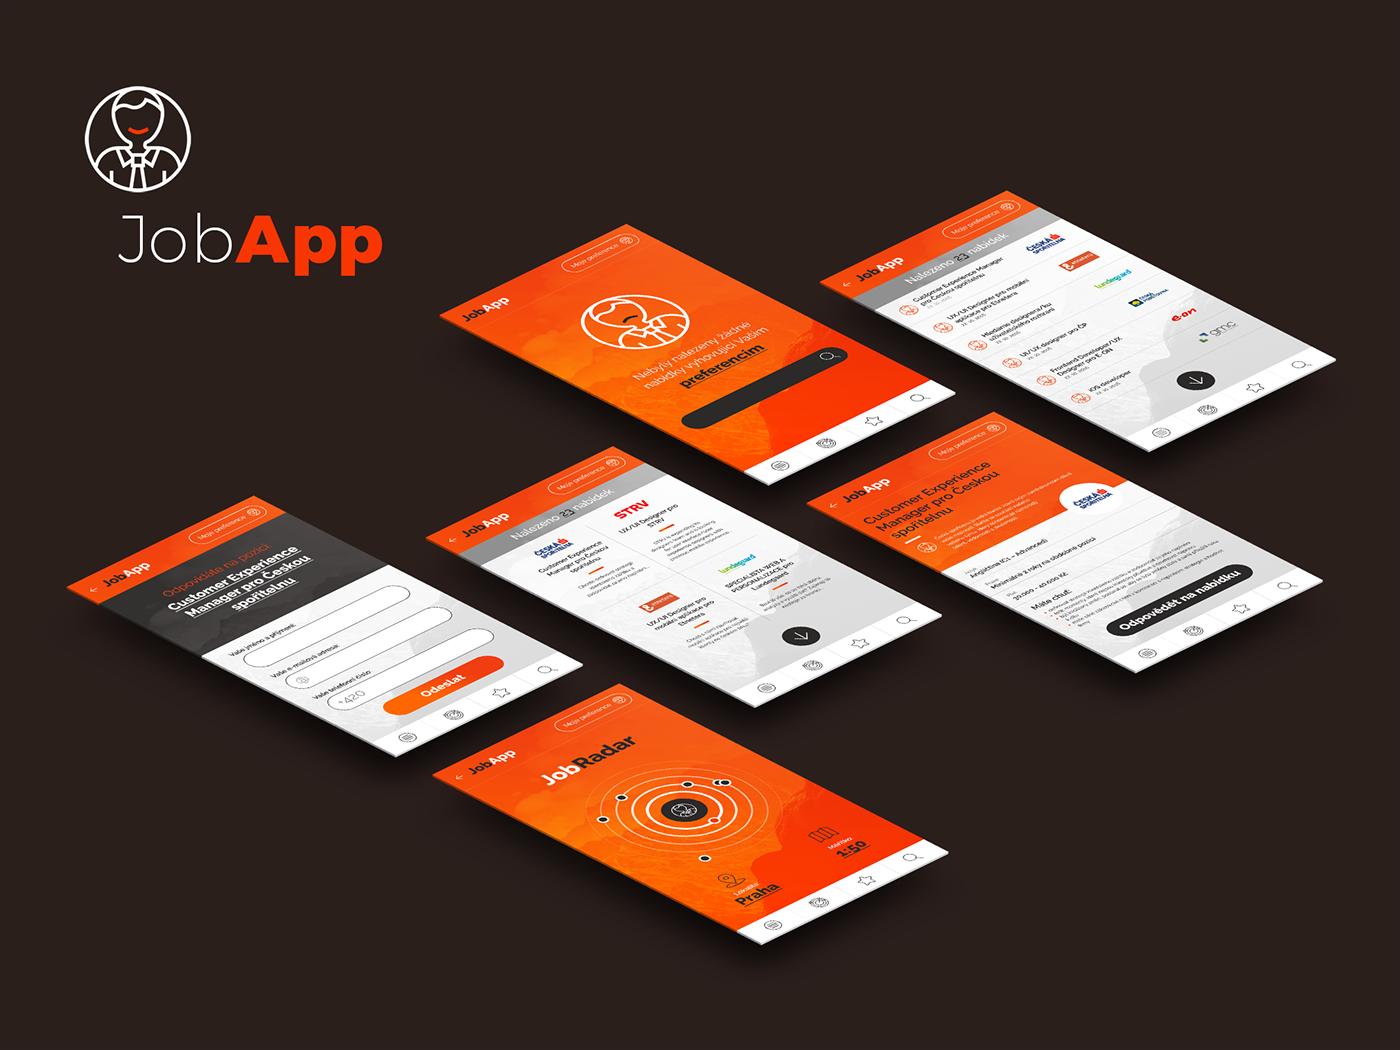 app UI ios android job